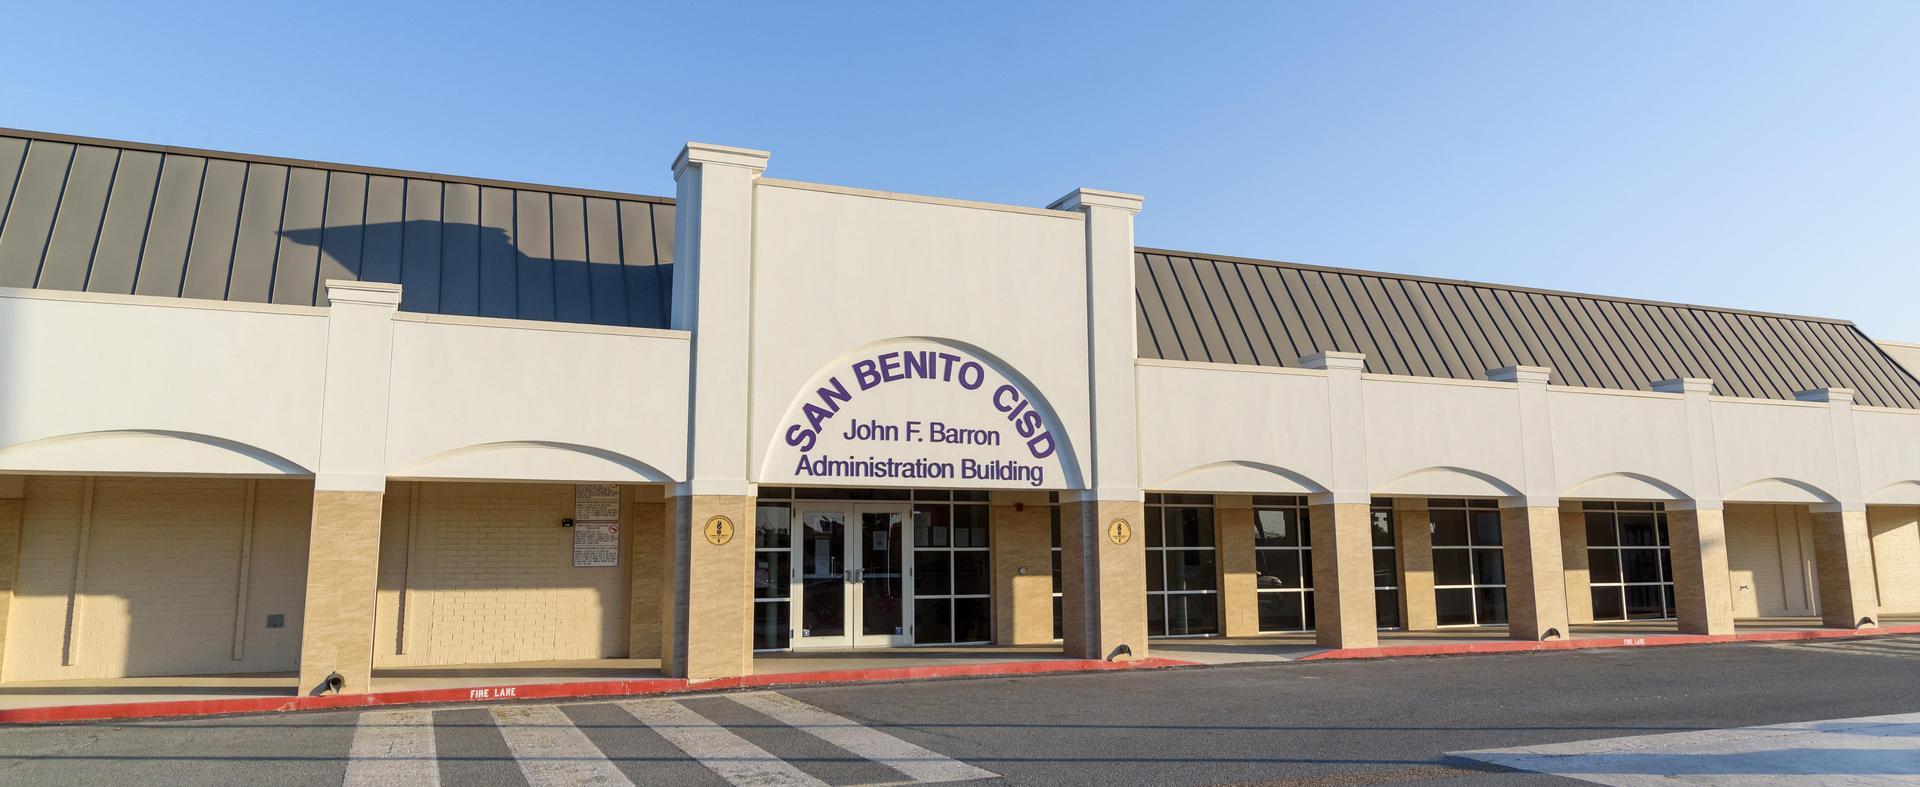 John F. Barron Adm Building